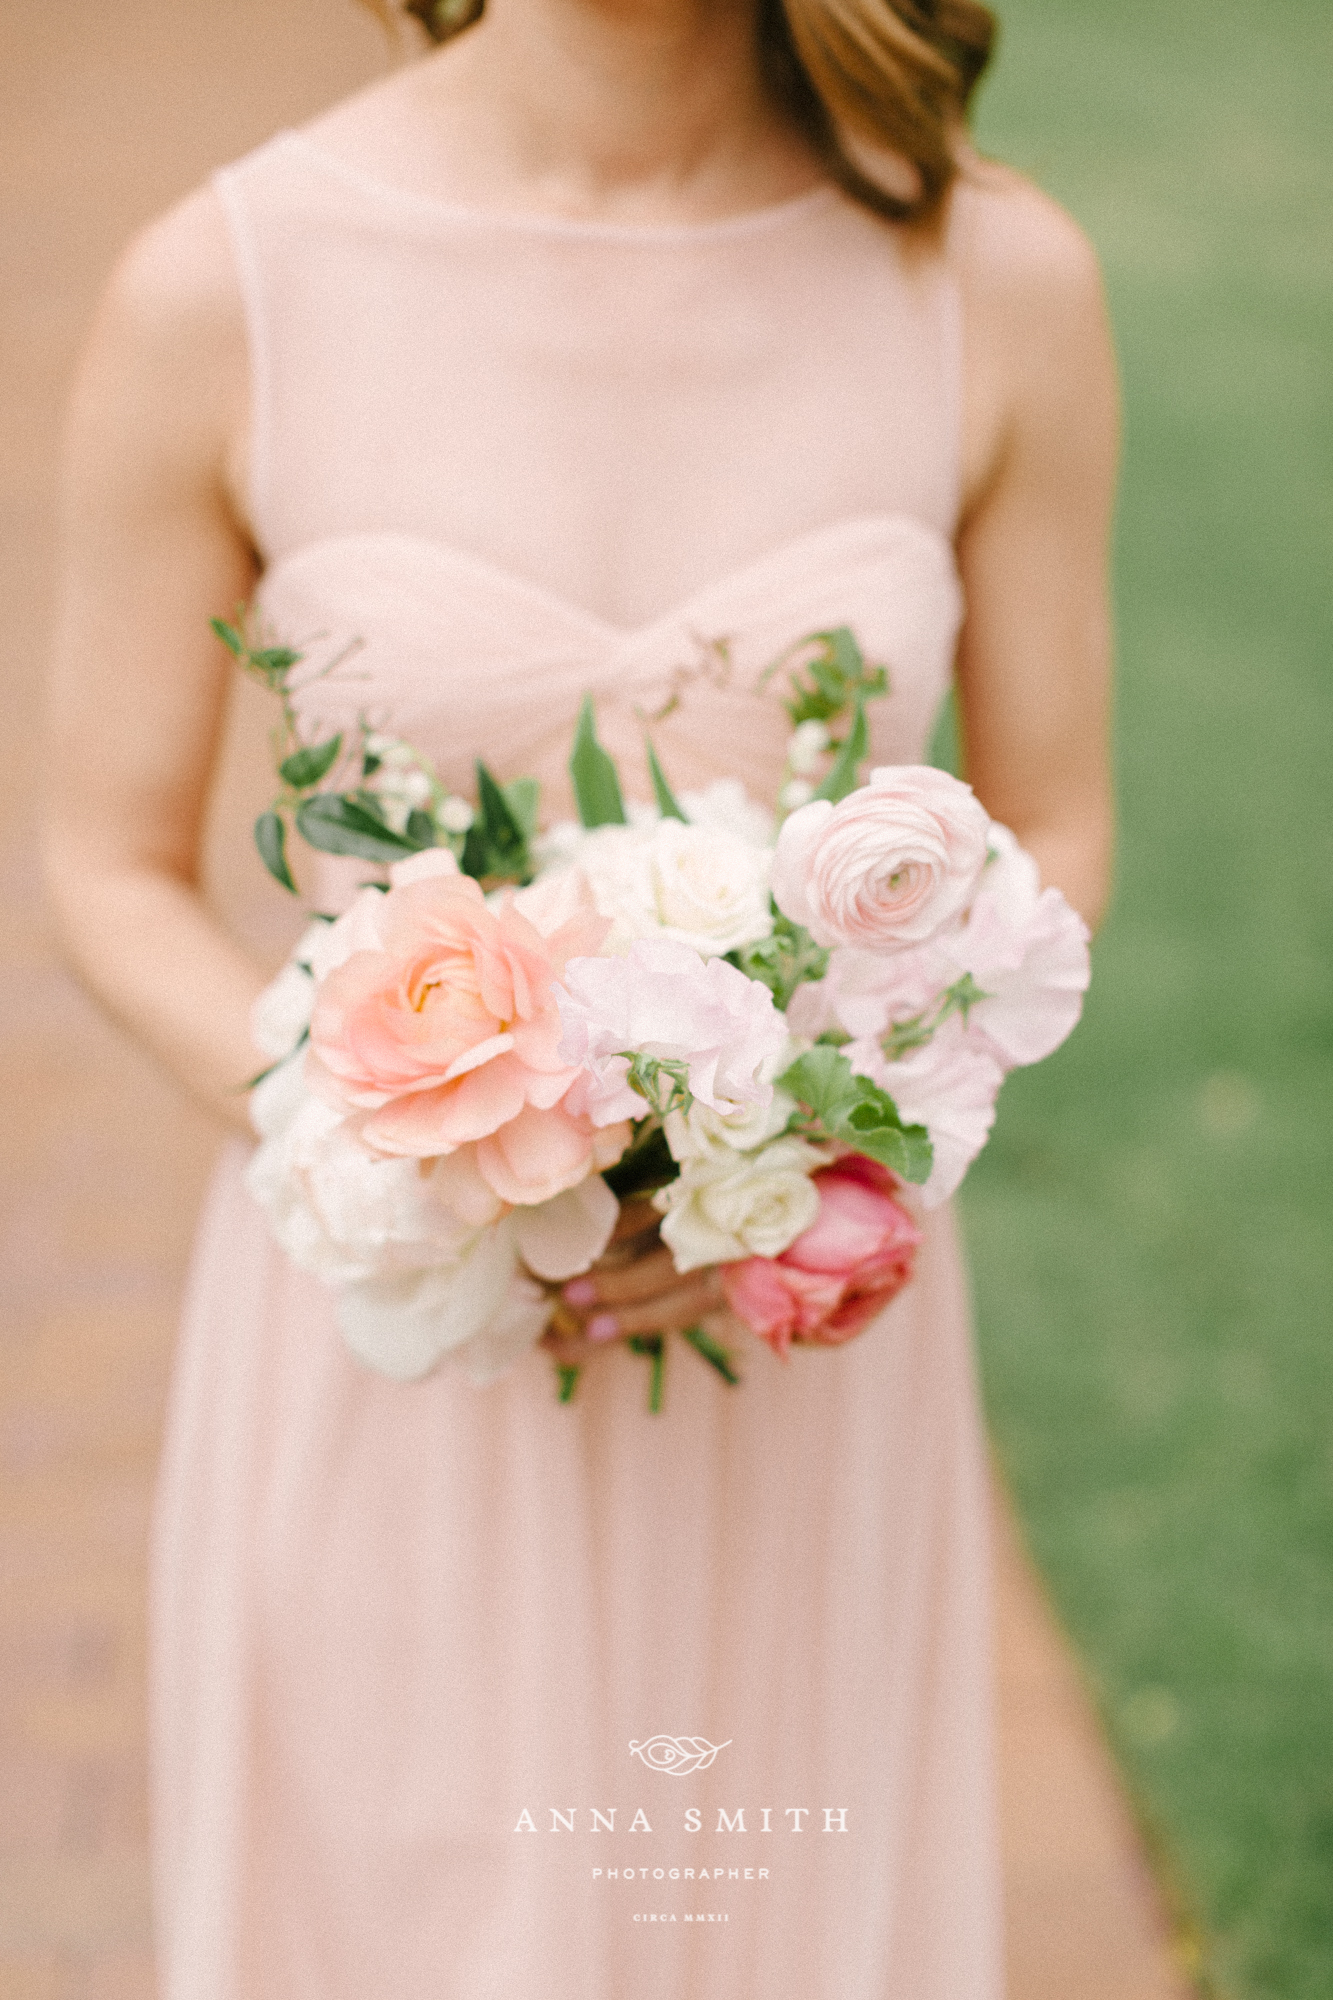 web 17- 4-W-CD-heather brandon wedding perkins adolphus-243.jpg